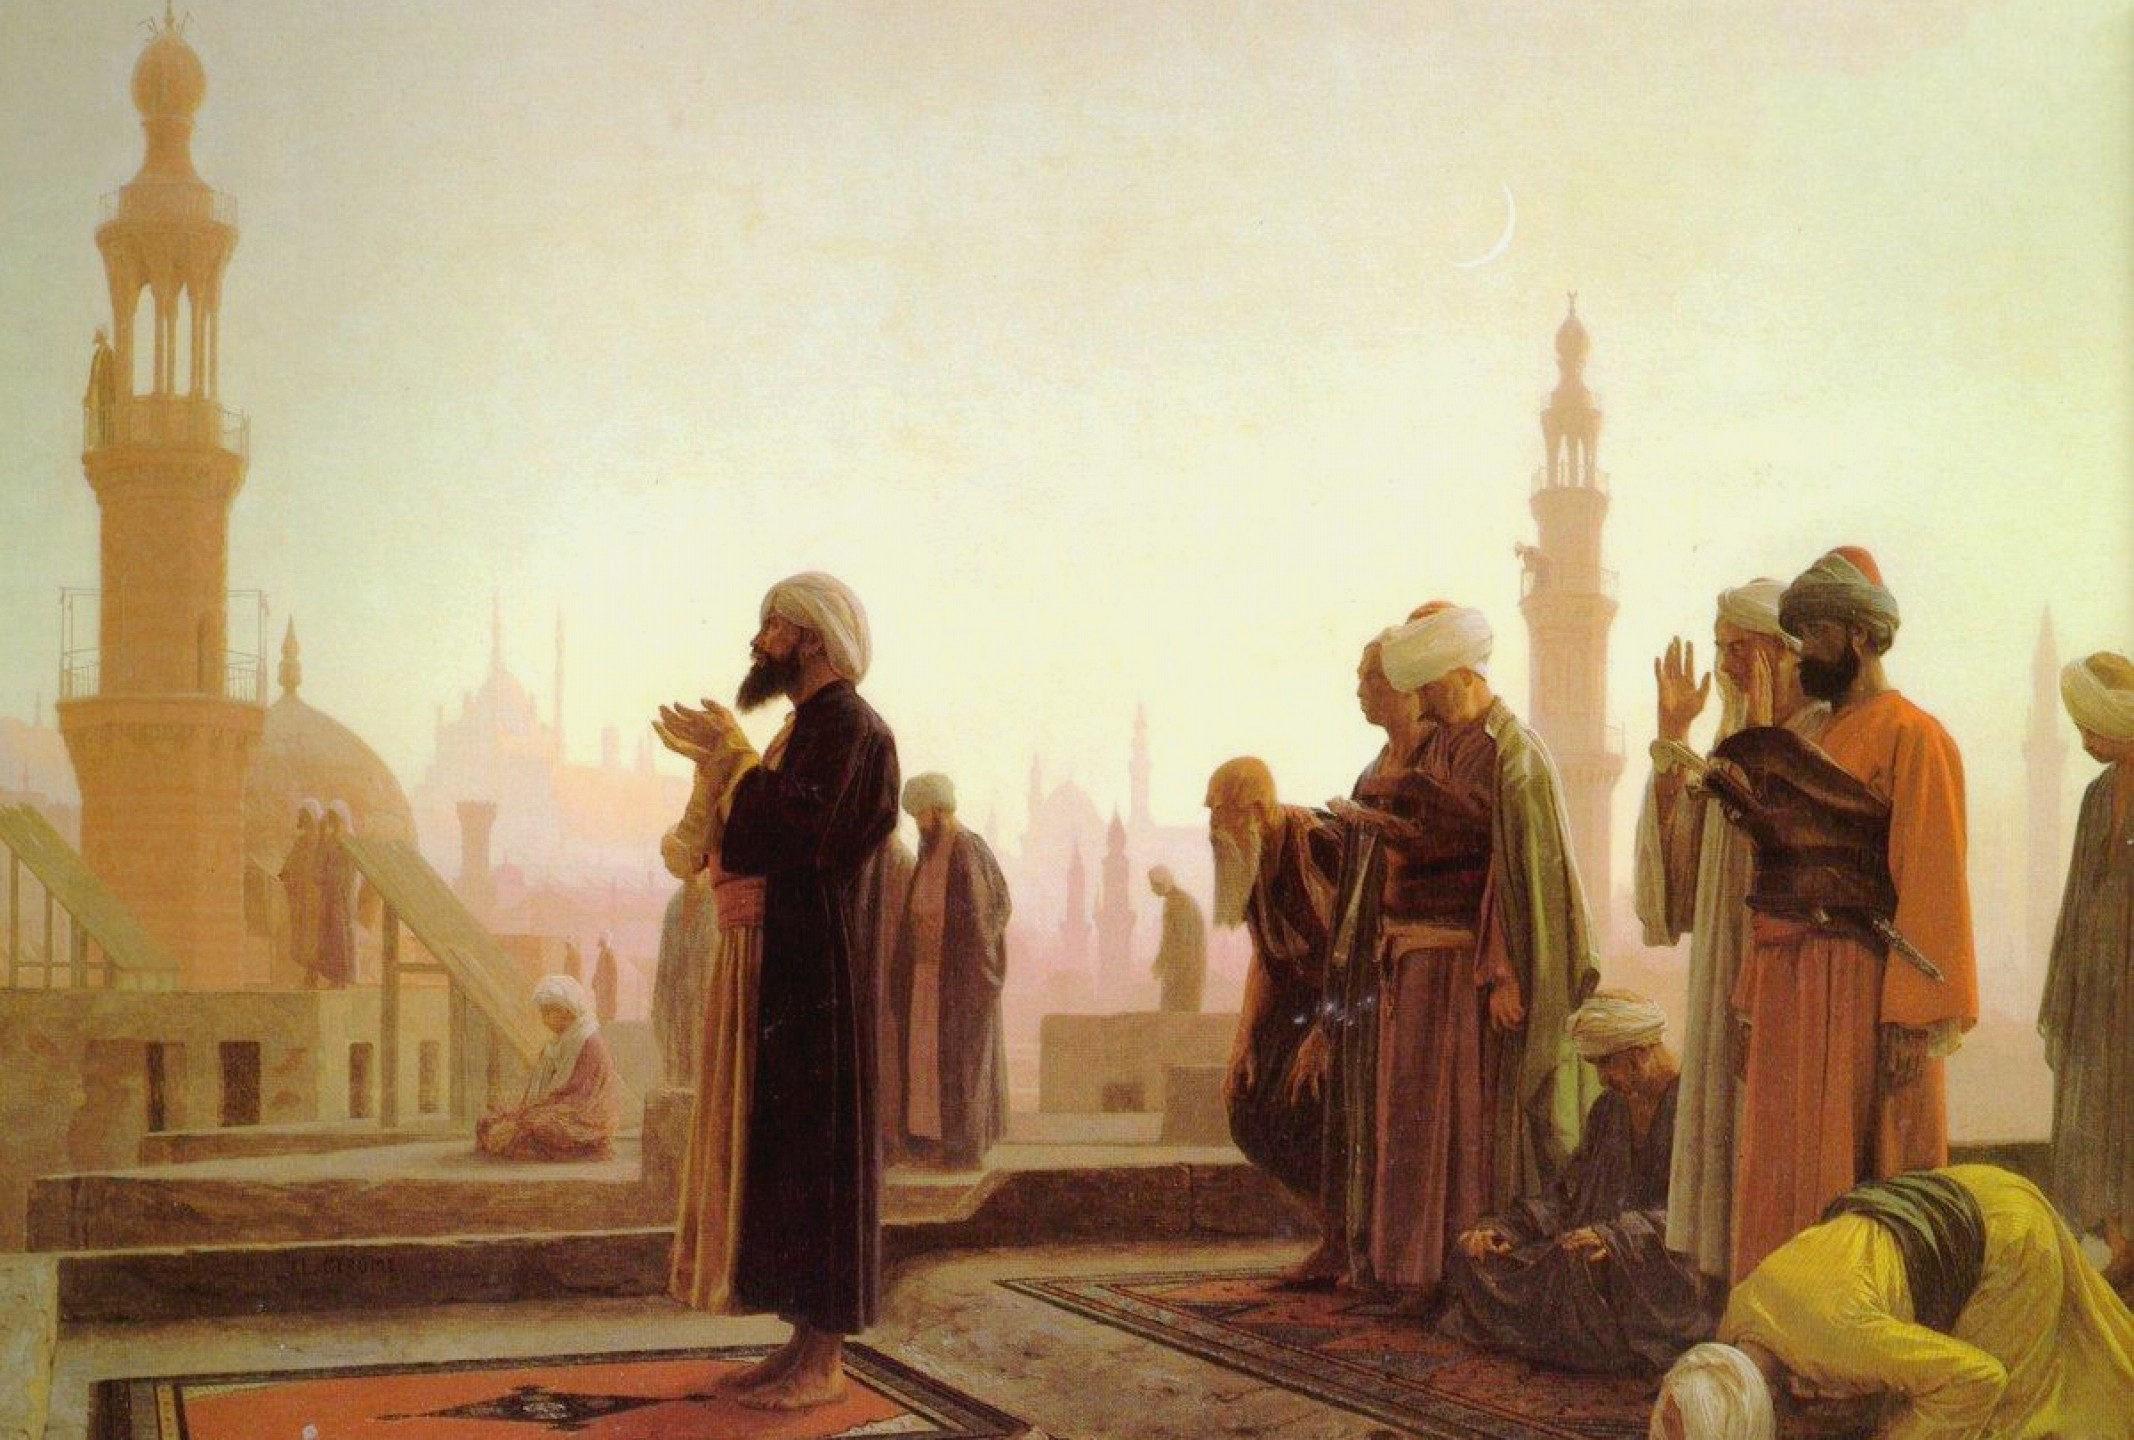 Abbas bin Ubadah - Surau.co